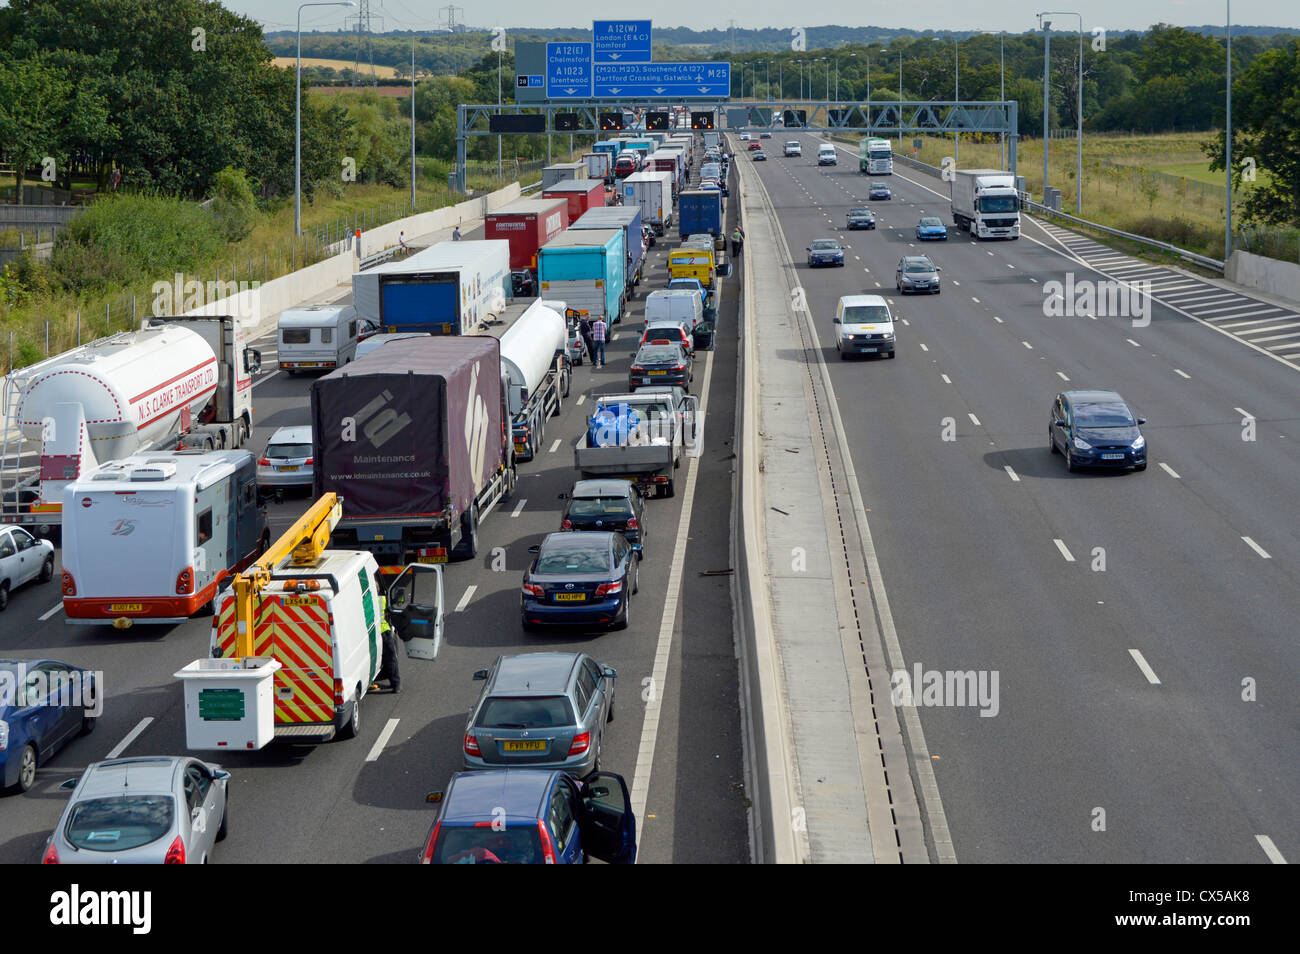 Stationary traffic gridlocked on four lanes of M25 motorway - Stock Image